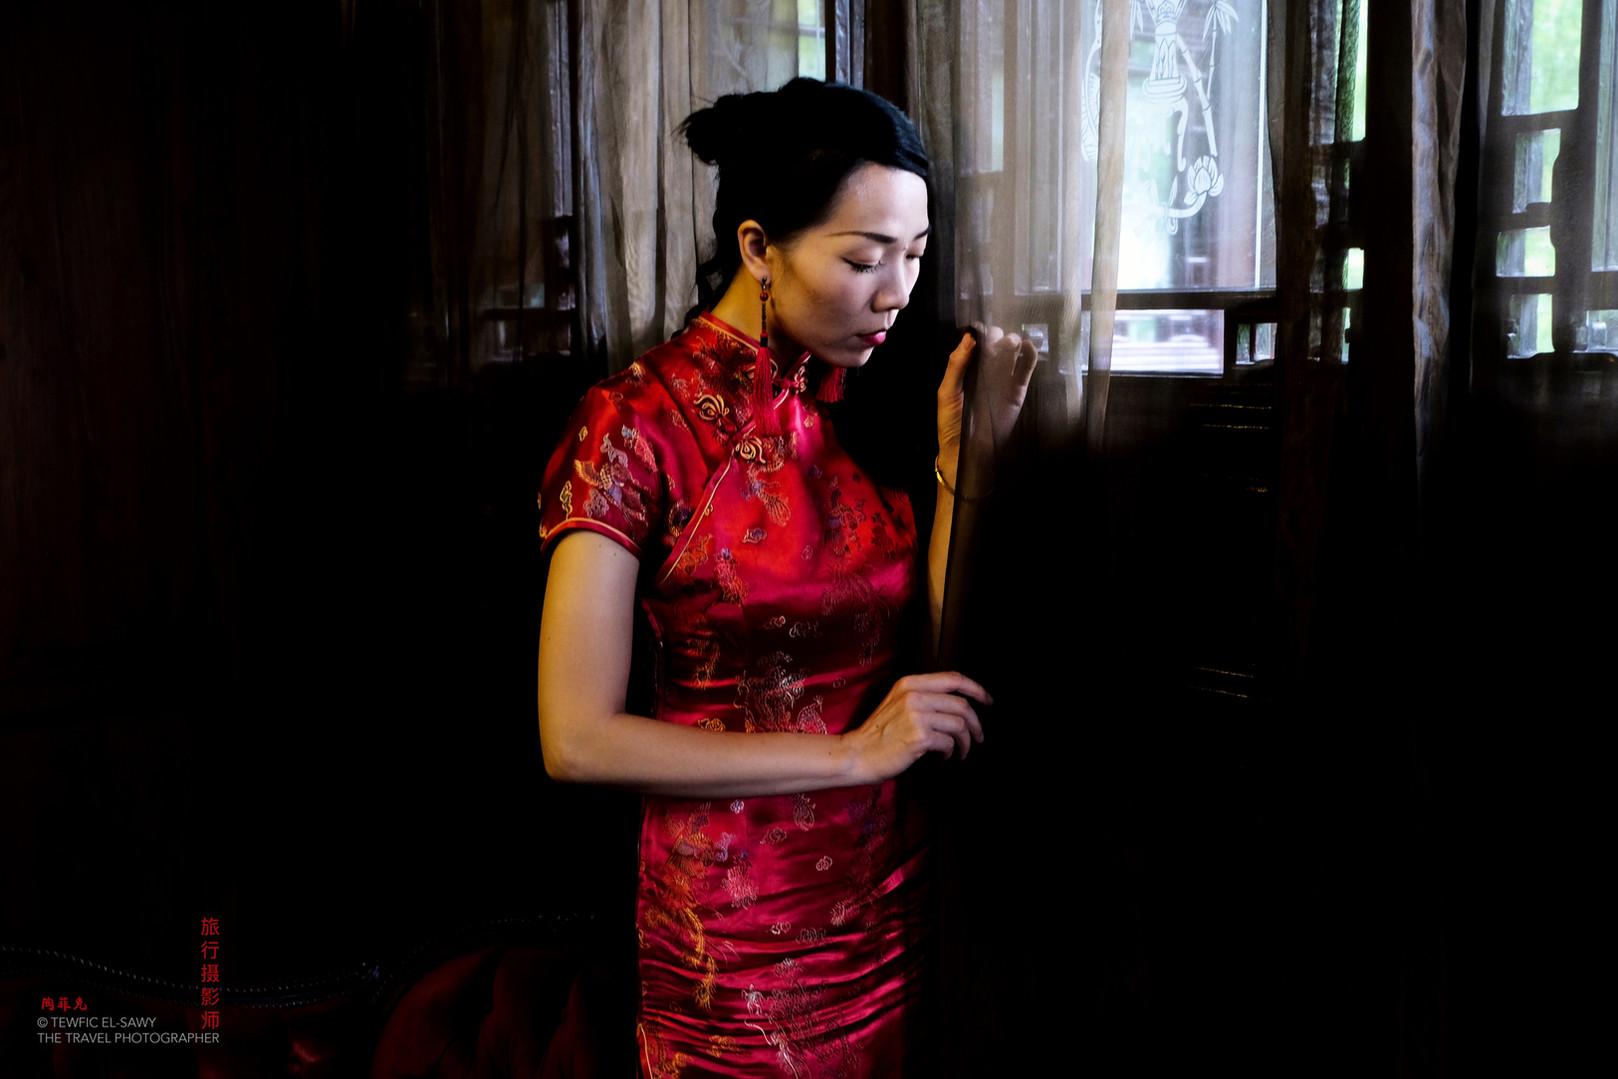 The Girl of Nanjing